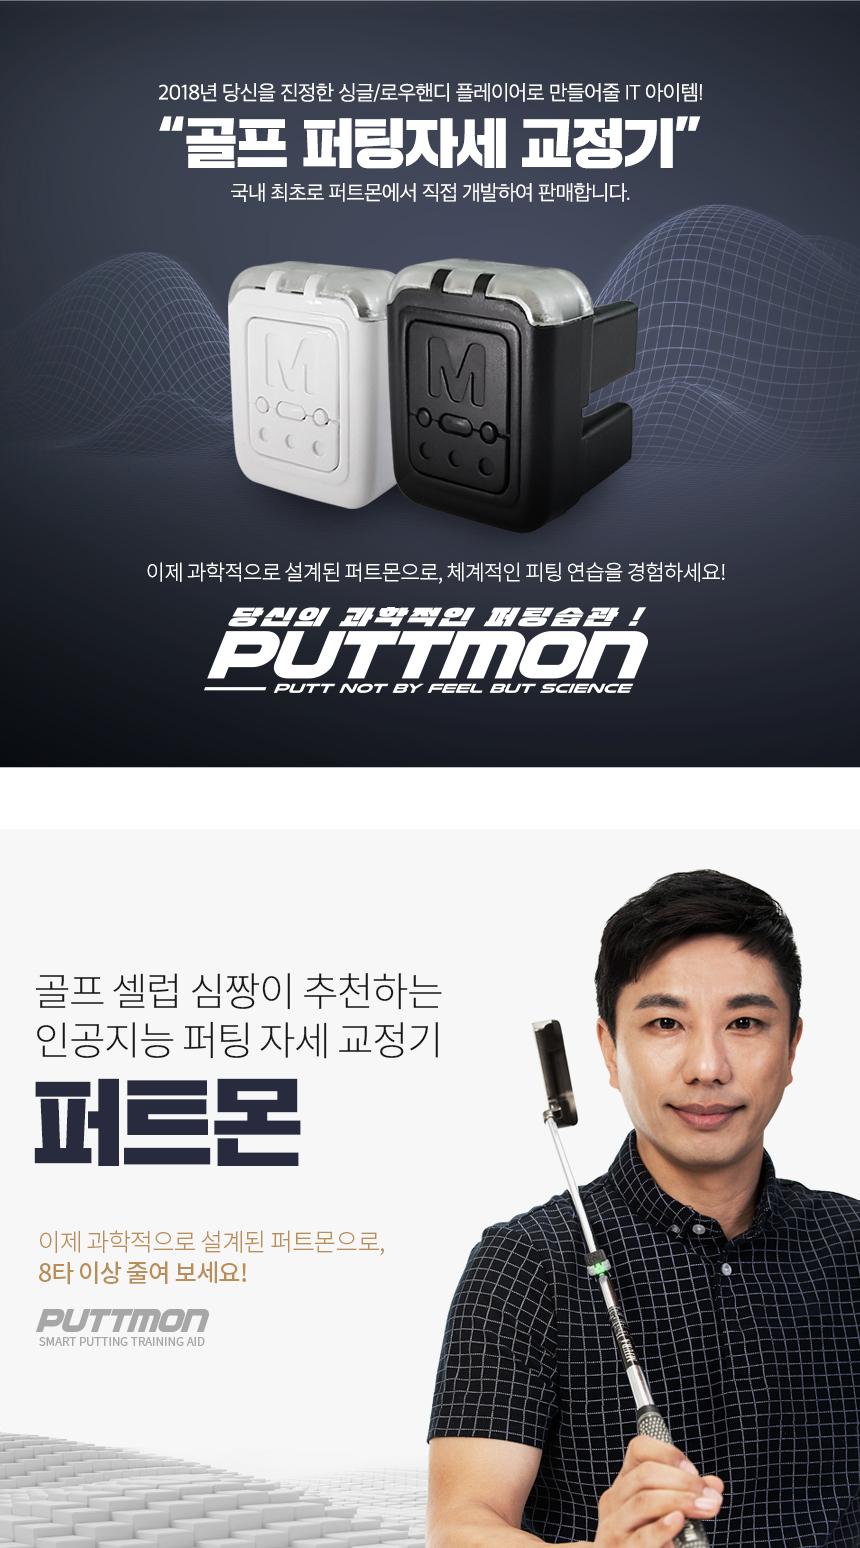 puttmon_smart_putting_training.jpg